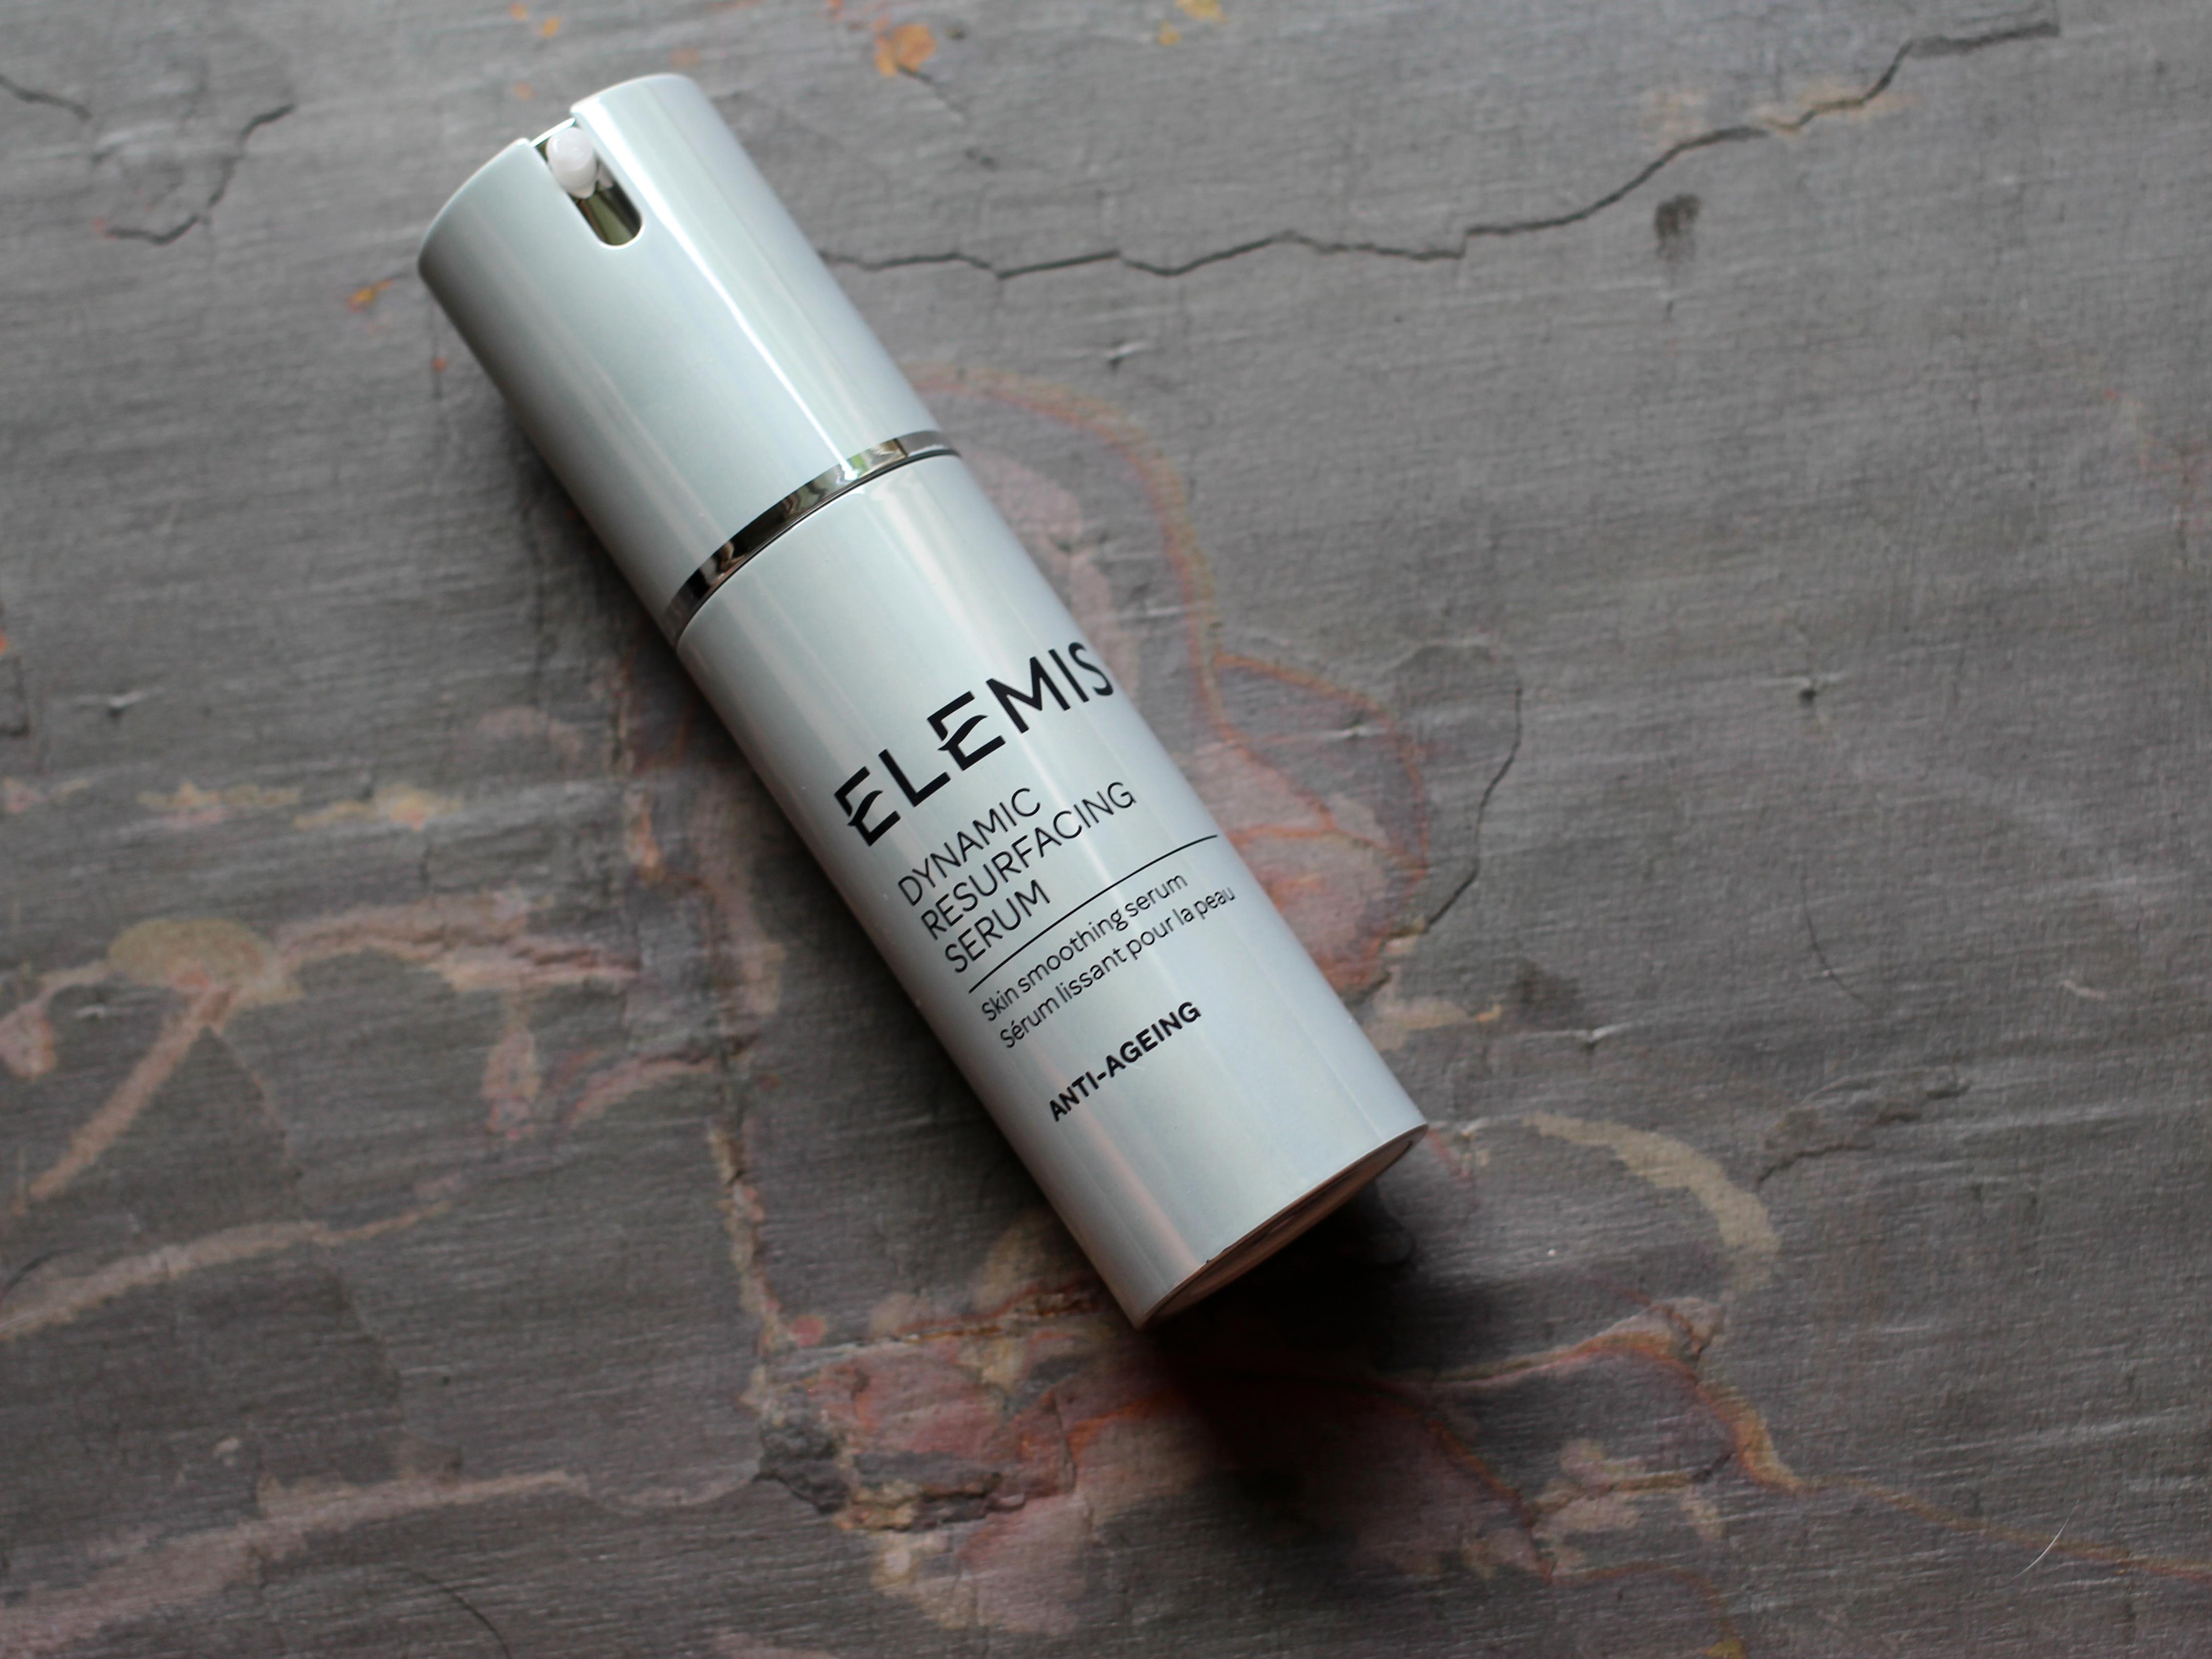 Elemis Dynamic Resurfacing Serum Review